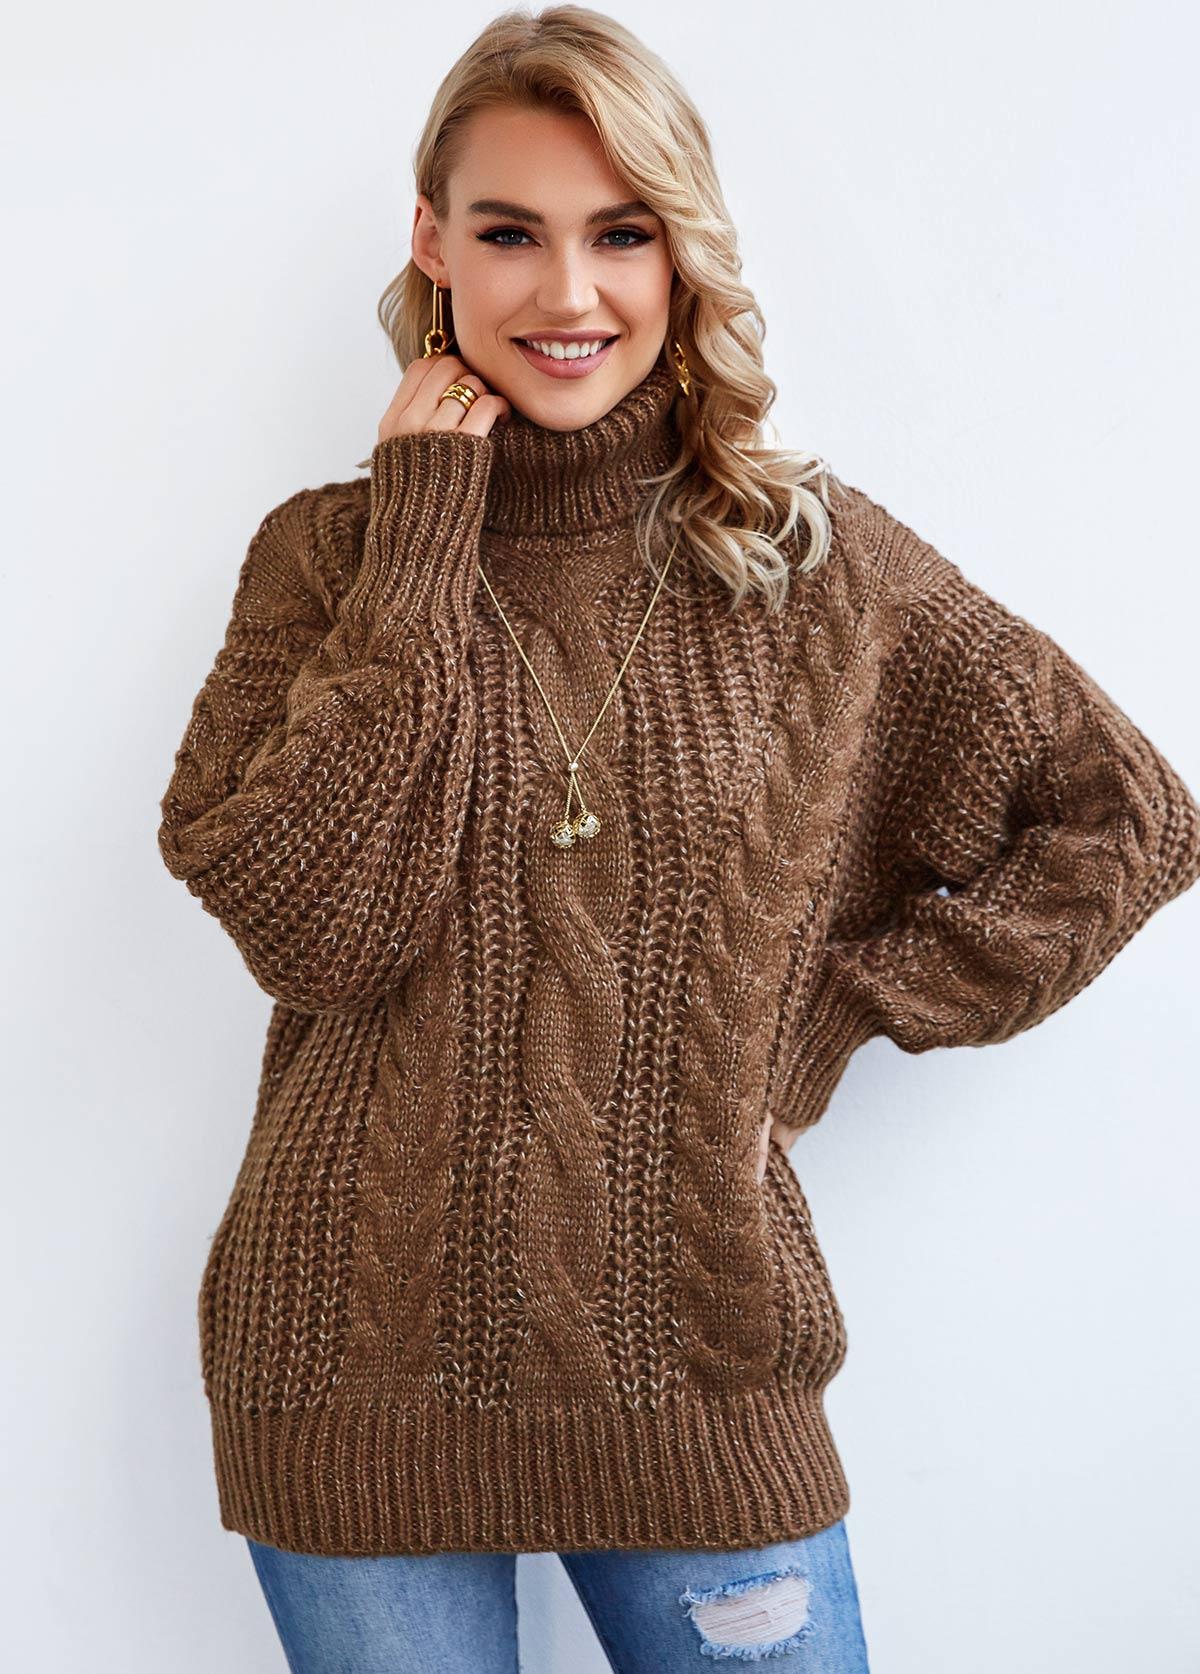 Twisted Pattern Long Sleeve Turtleneck Sweater